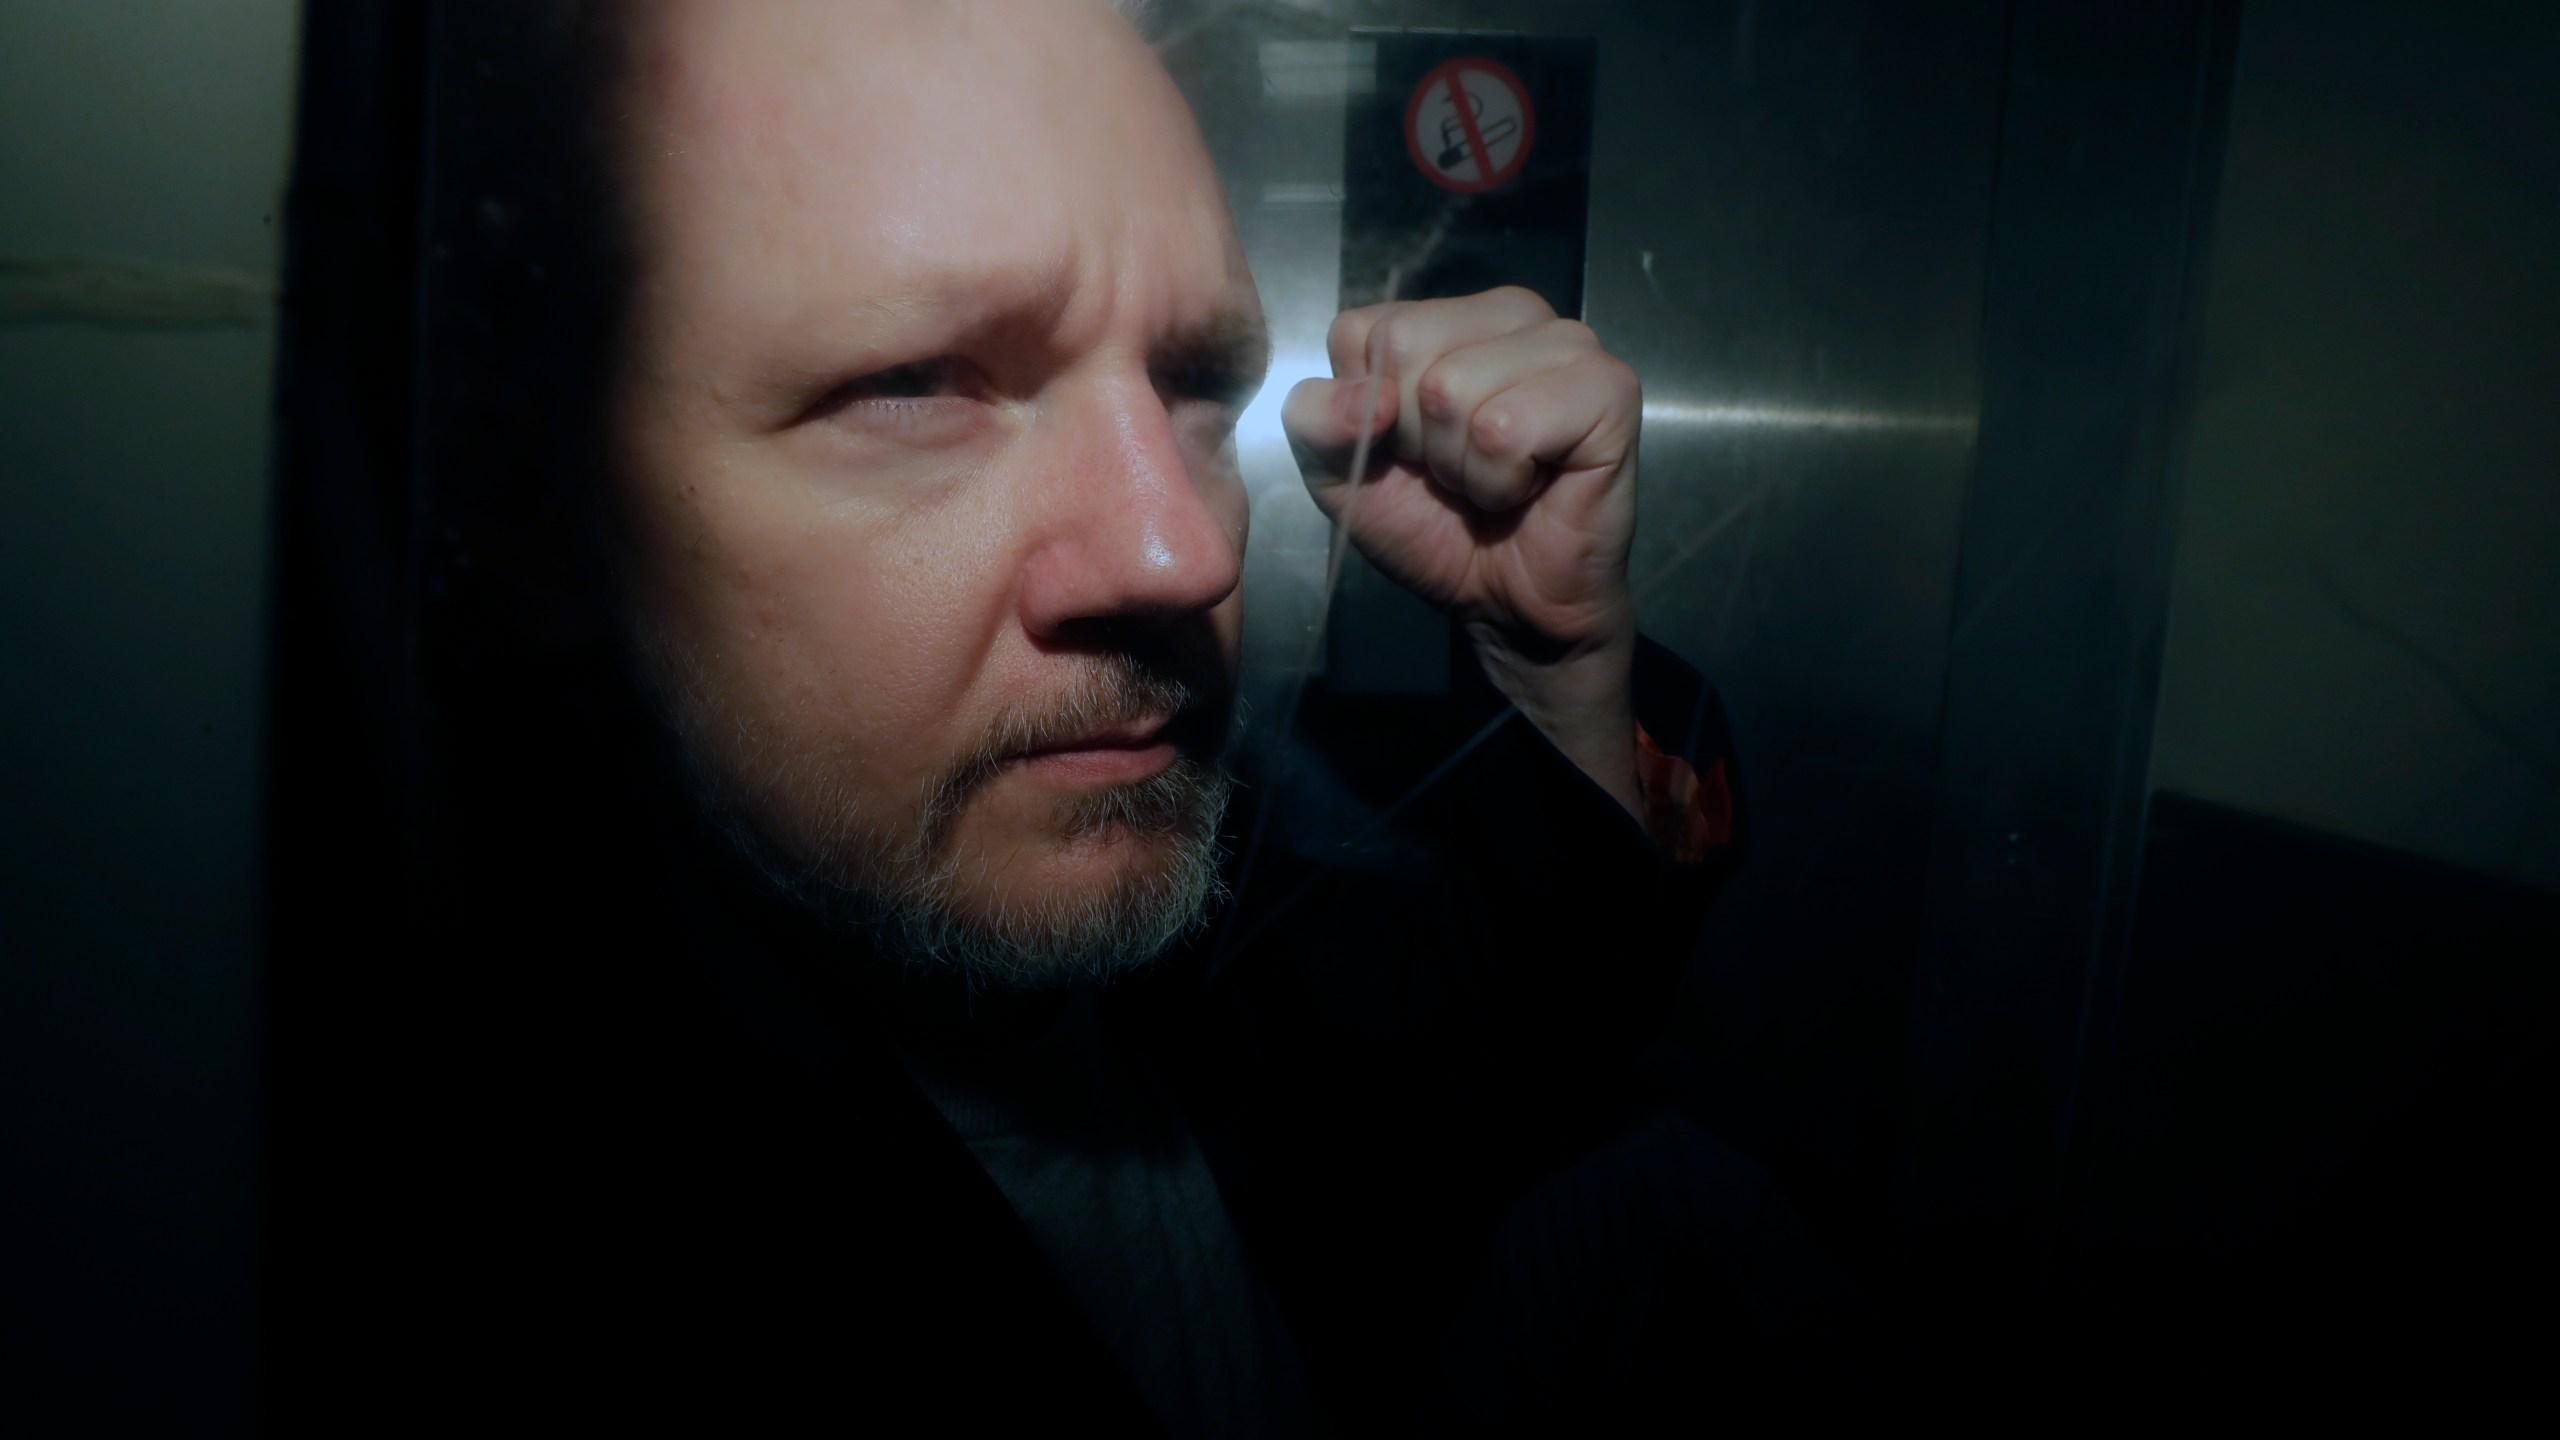 WikiLeaks founder Julian Assange puts his fist up as he is taken from court in London